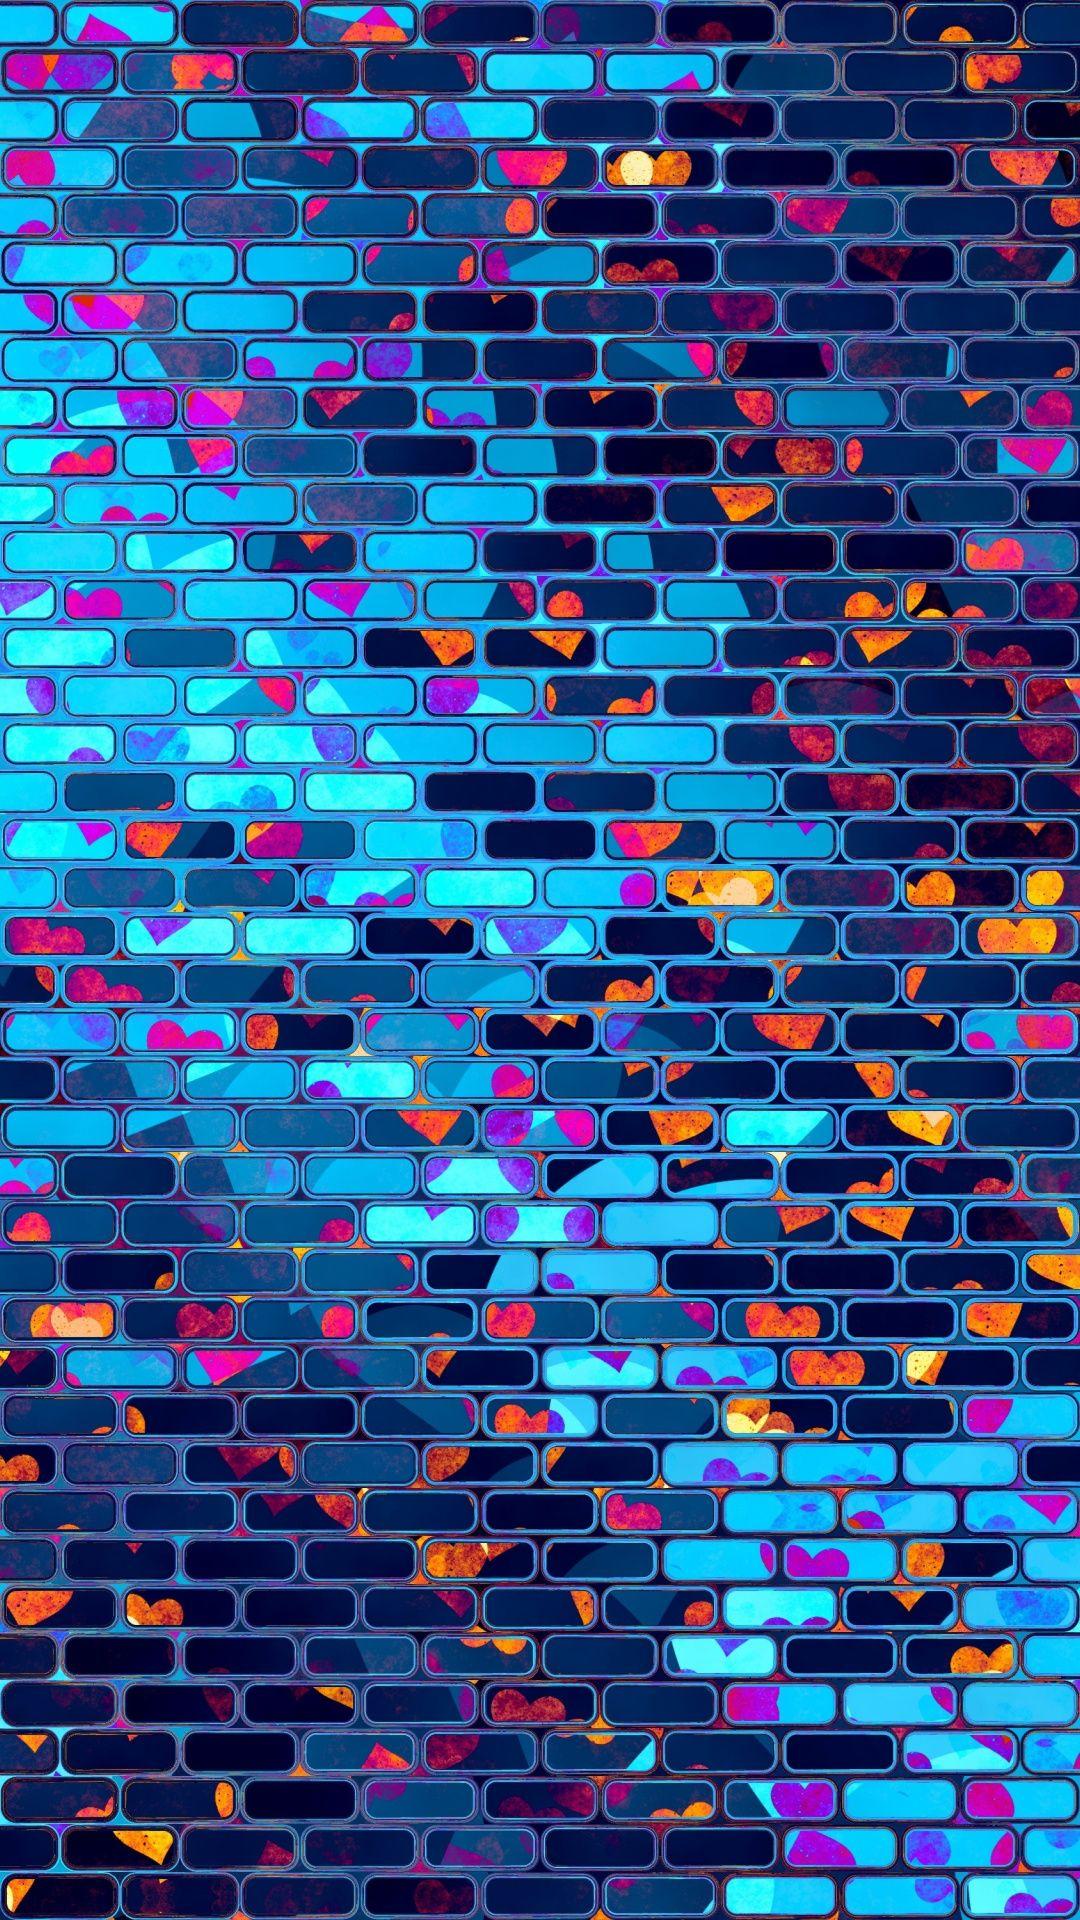 Neon, hearts, brick wall, 720x1280 wallpaper